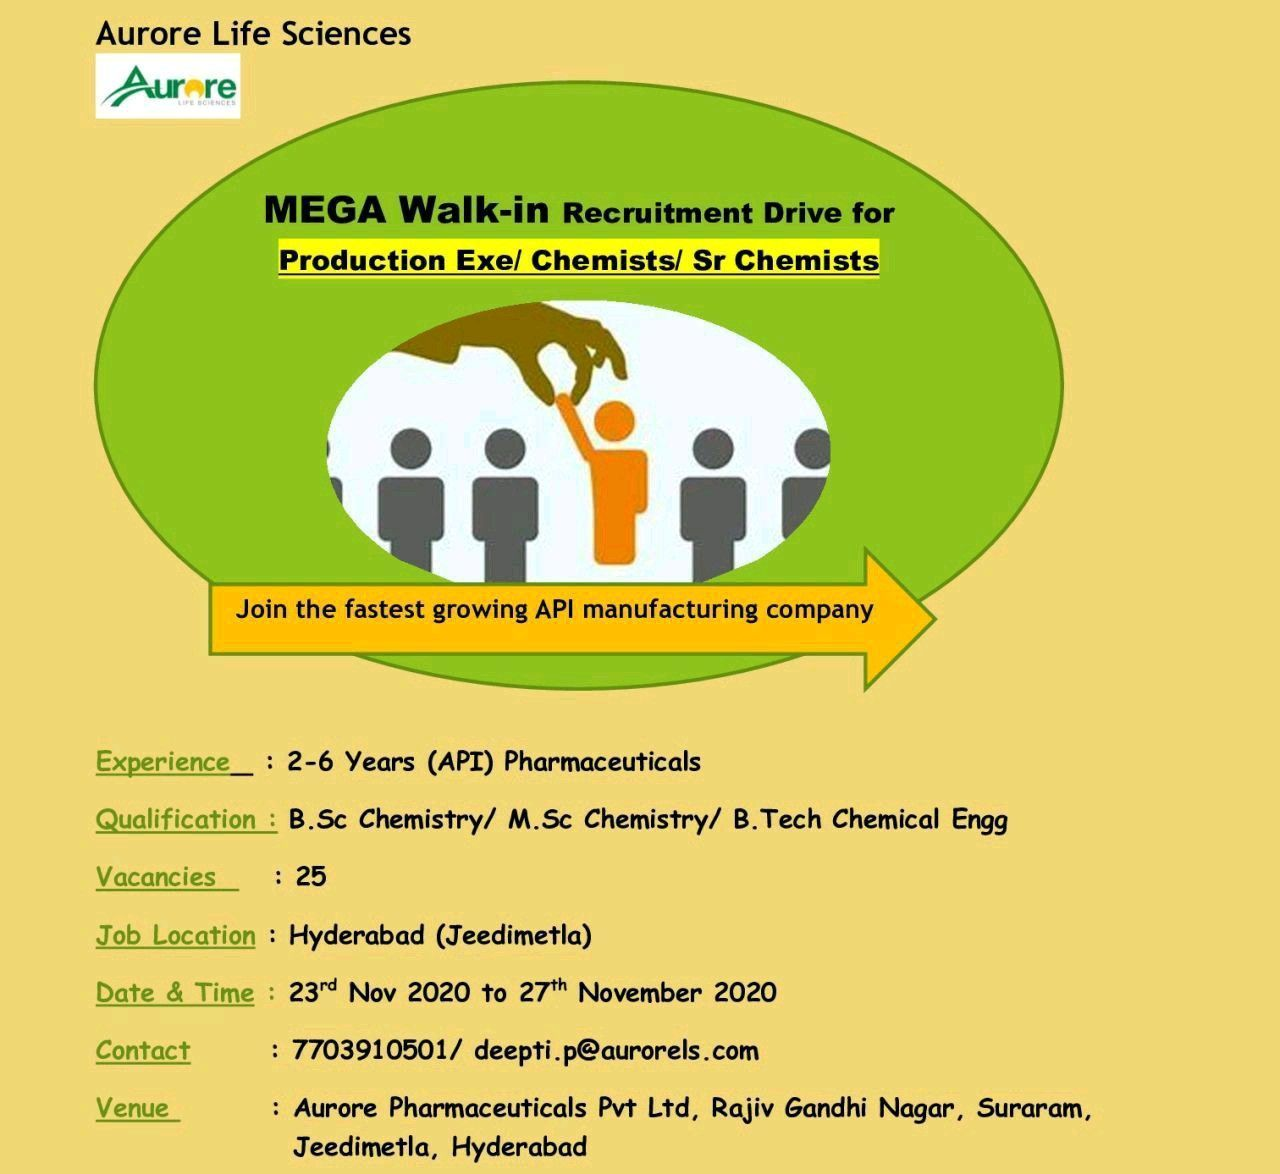 Aurore Pharmaceuticals Pvt Ltd  MEGA Walk-in Recruitment Drive for  Production Exe/ Chemists/ Sr Chemists